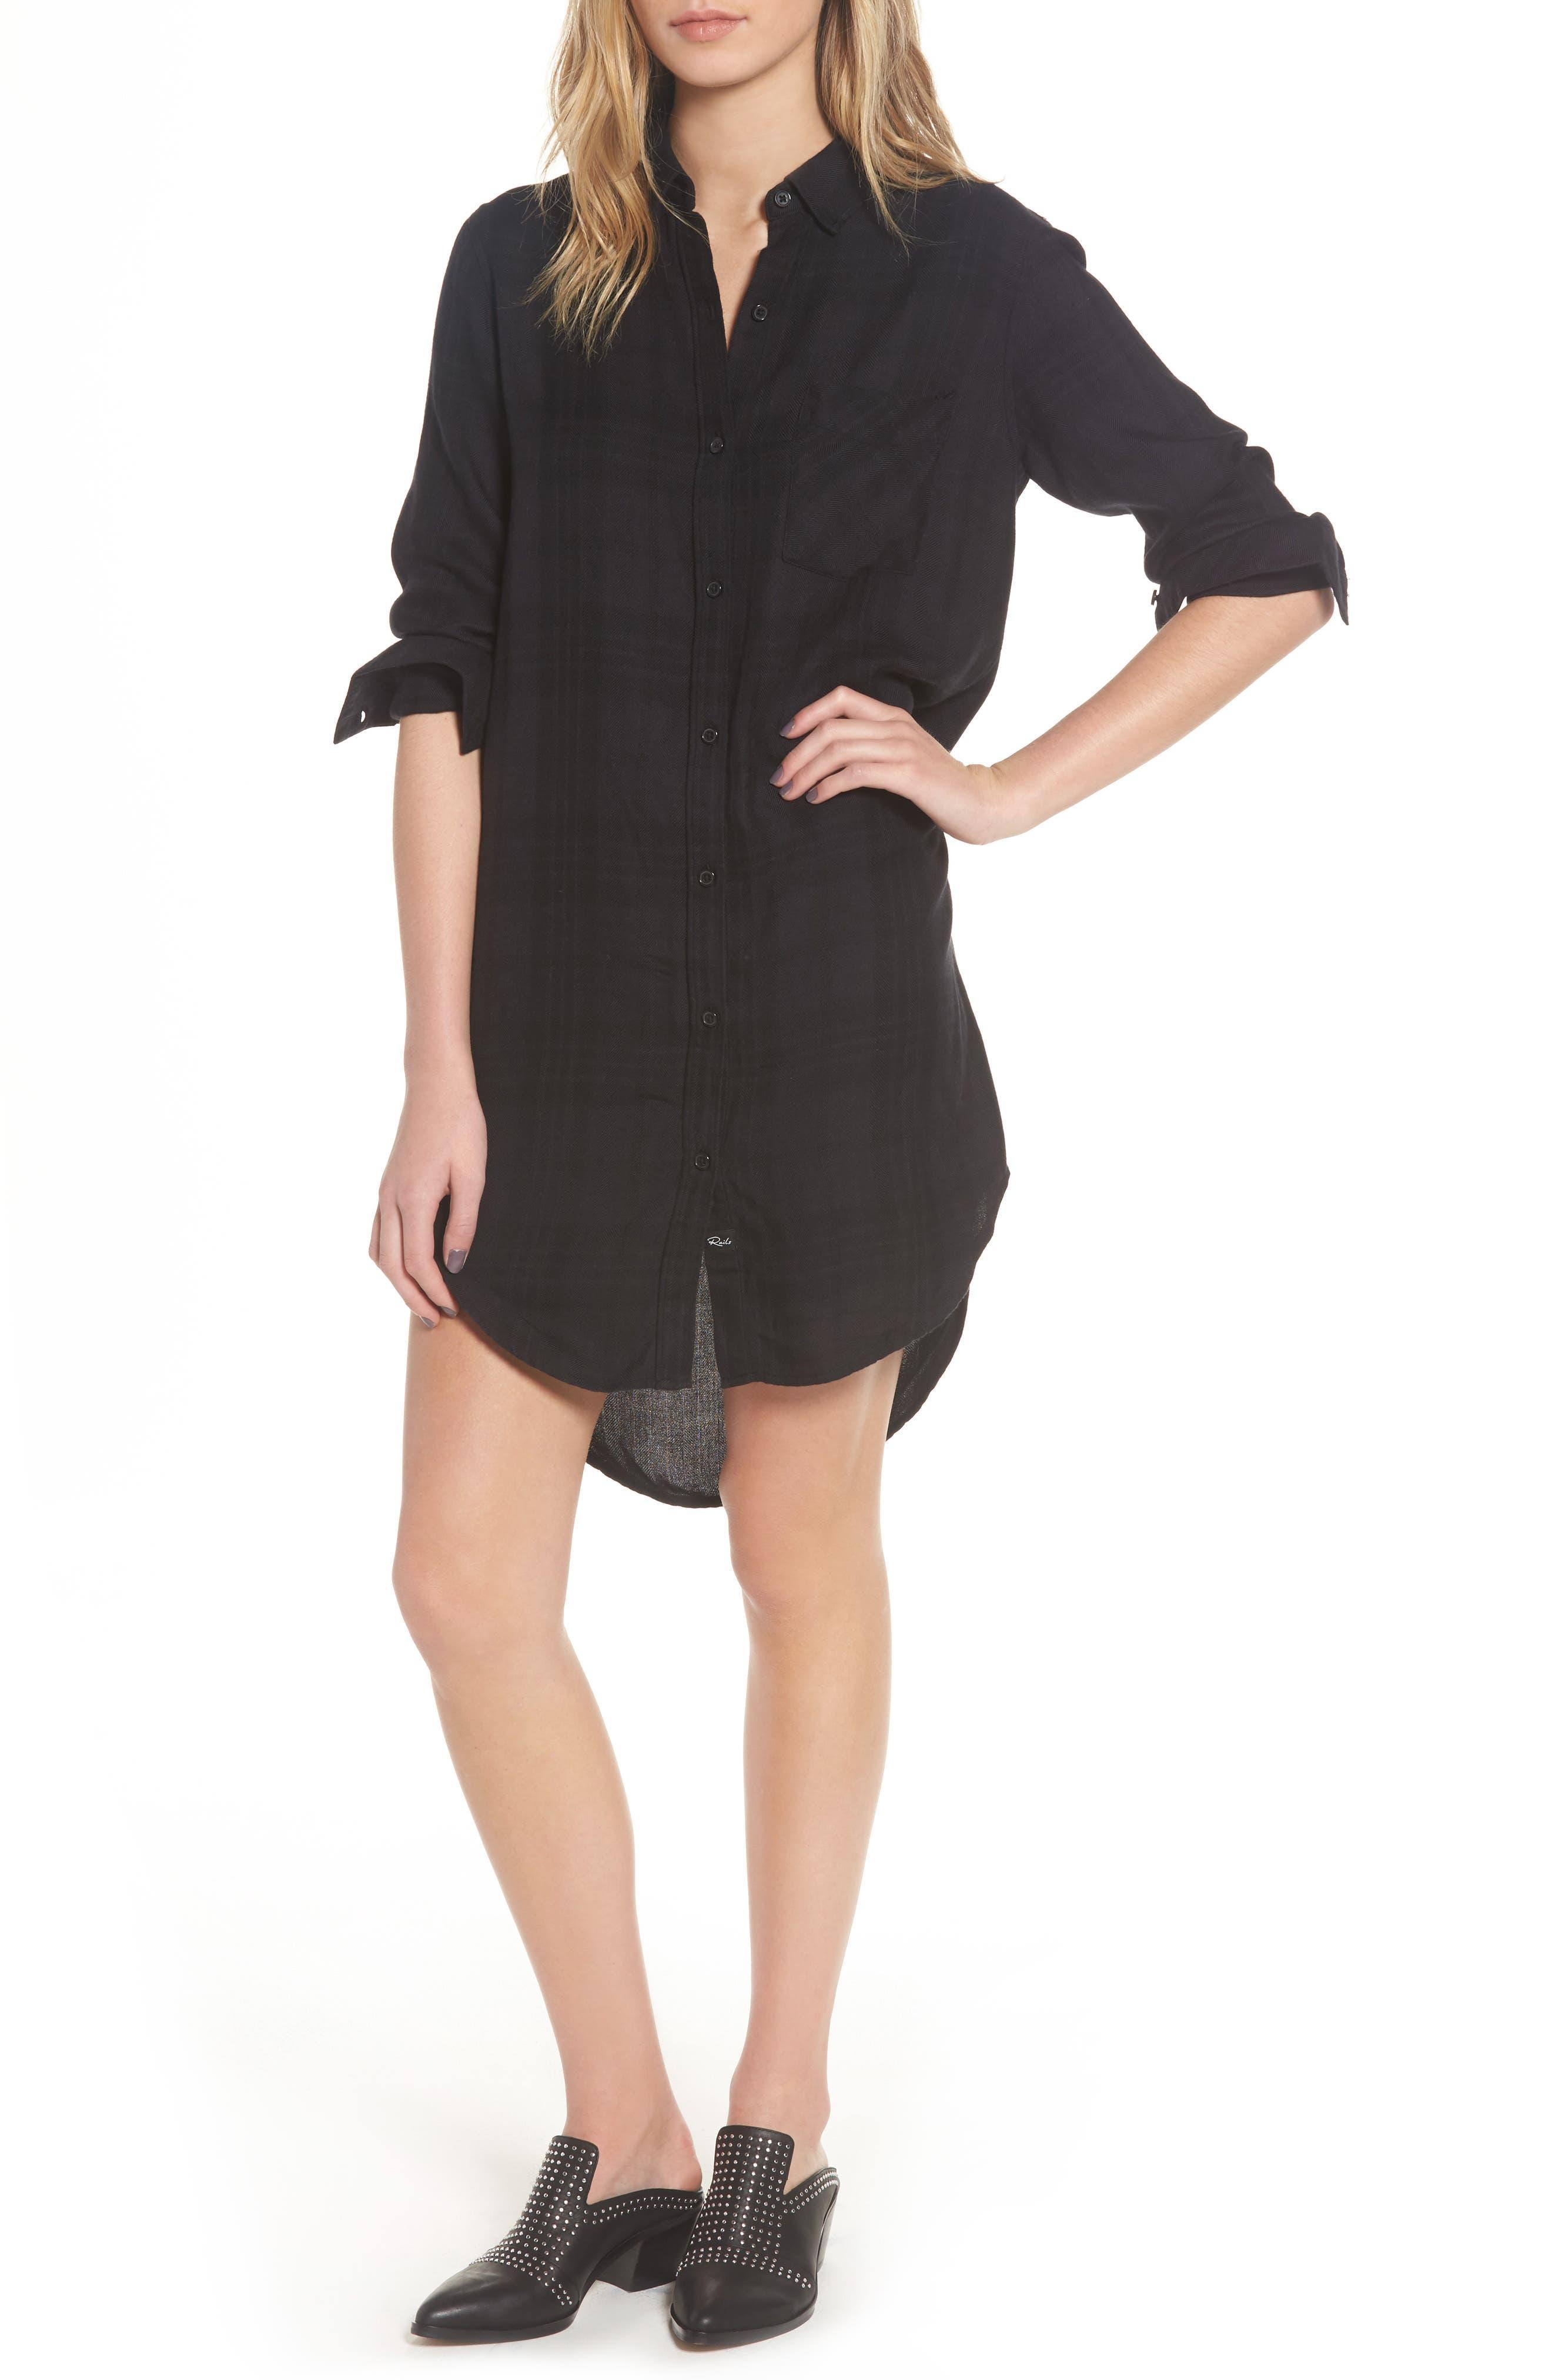 2b2fcdec7533 Band T Shirt Dress Plus Size   Toffee Art